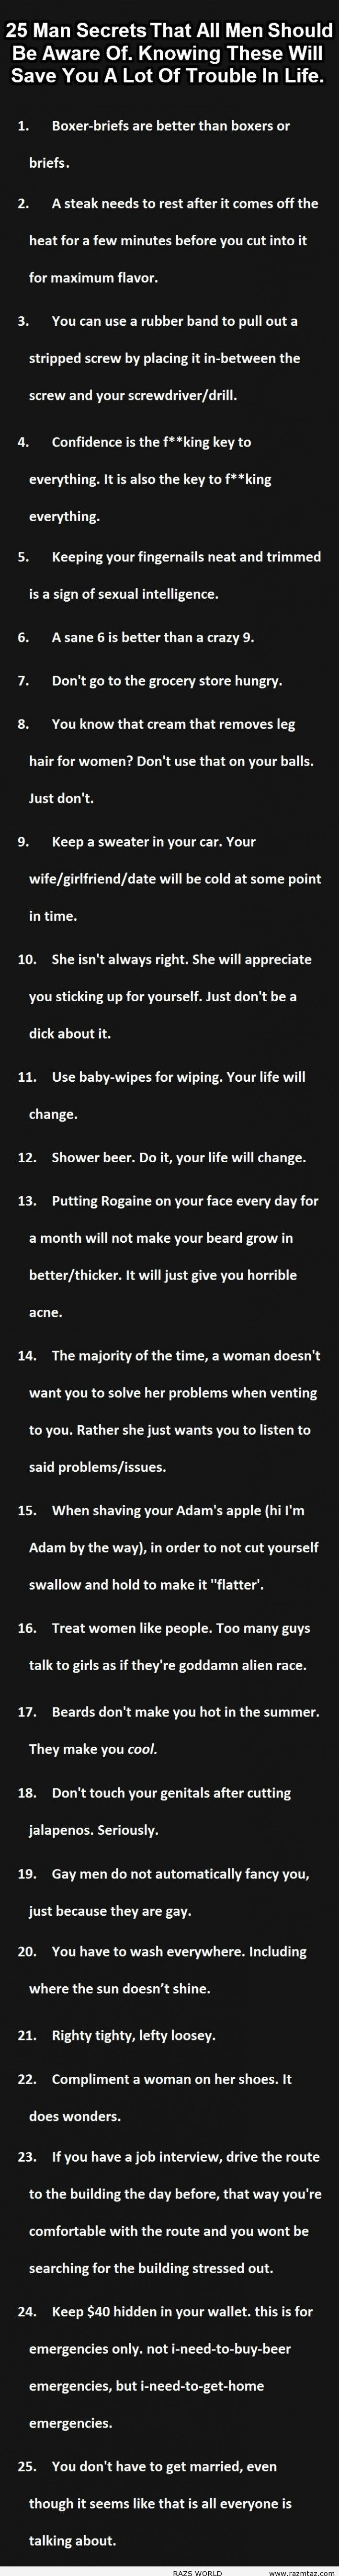 25 Man Secrets That All Men Should Be Aware Of - M...